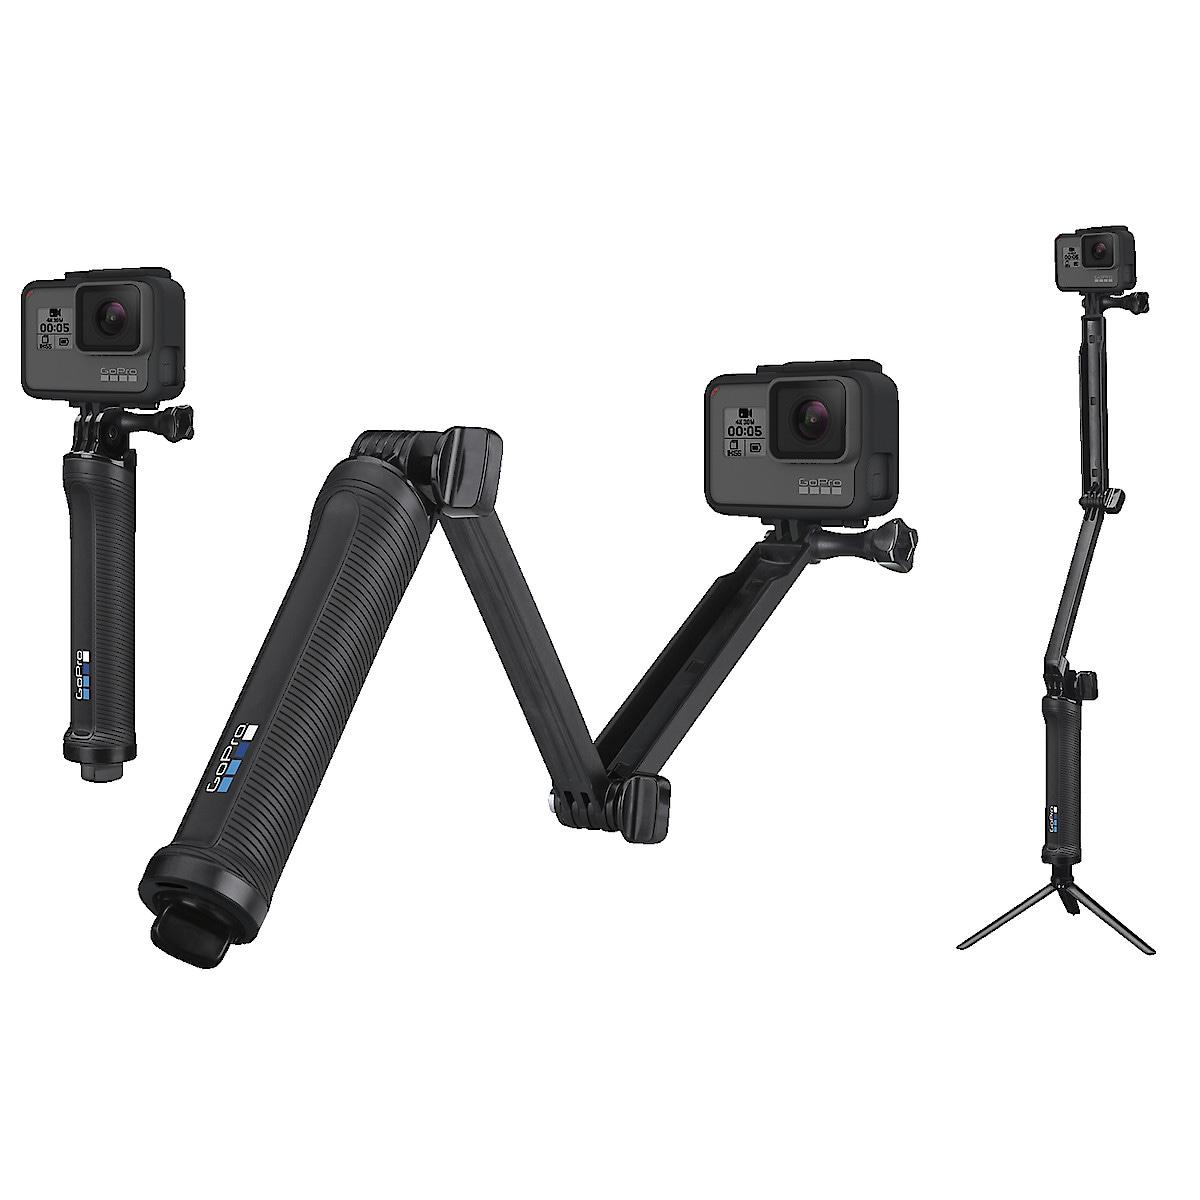 Handtag/stativ GoPro 3-Way